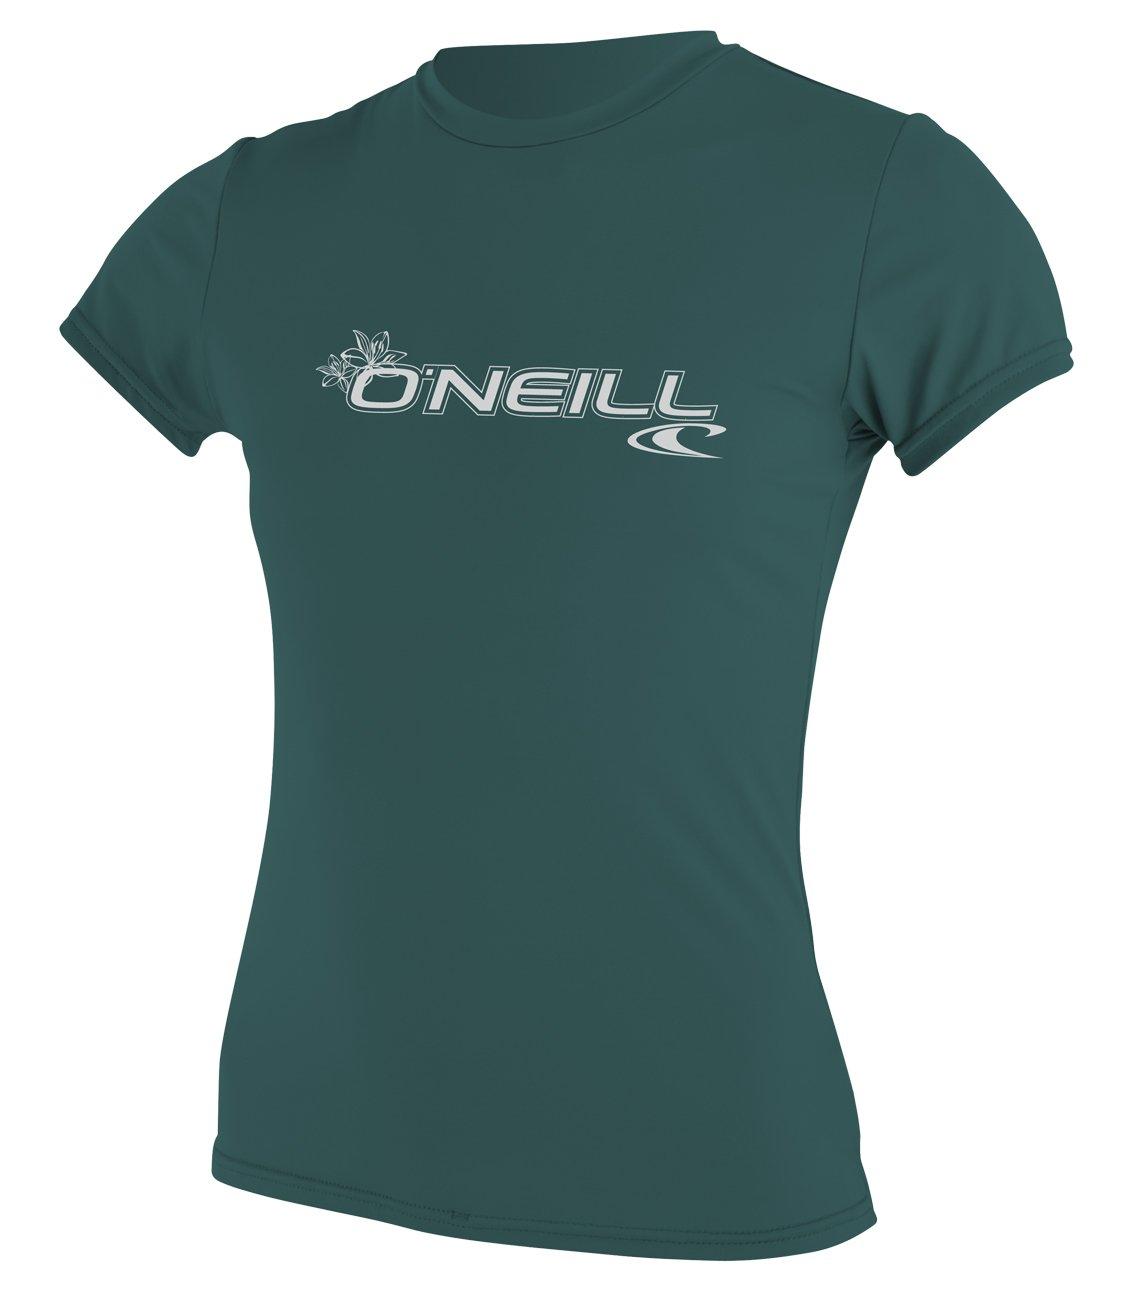 O'Neill Wetsuits Women's Basic Skins Upf 50+ Short Sleeve Sun Shirt, Deep Teal, X-Large by O'Neill Wetsuits